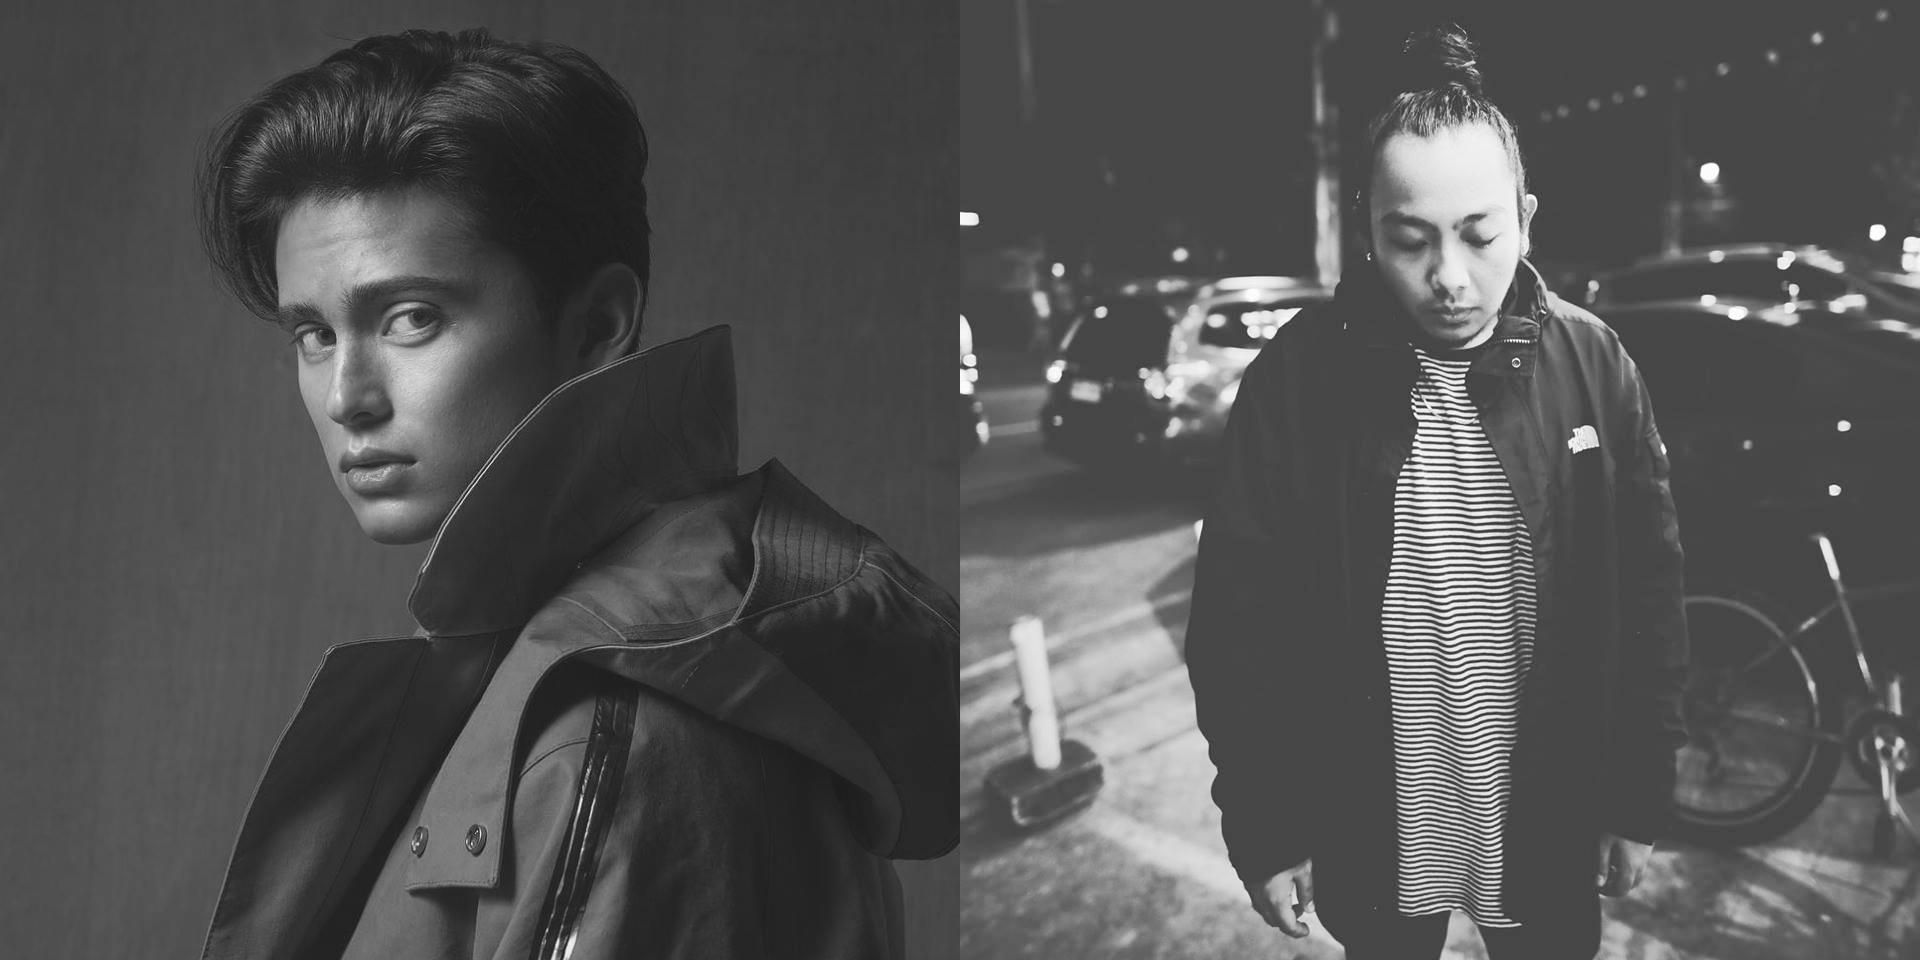 James Reid teams up with rapper Kris Delano on new single 'Soul Love' – listen